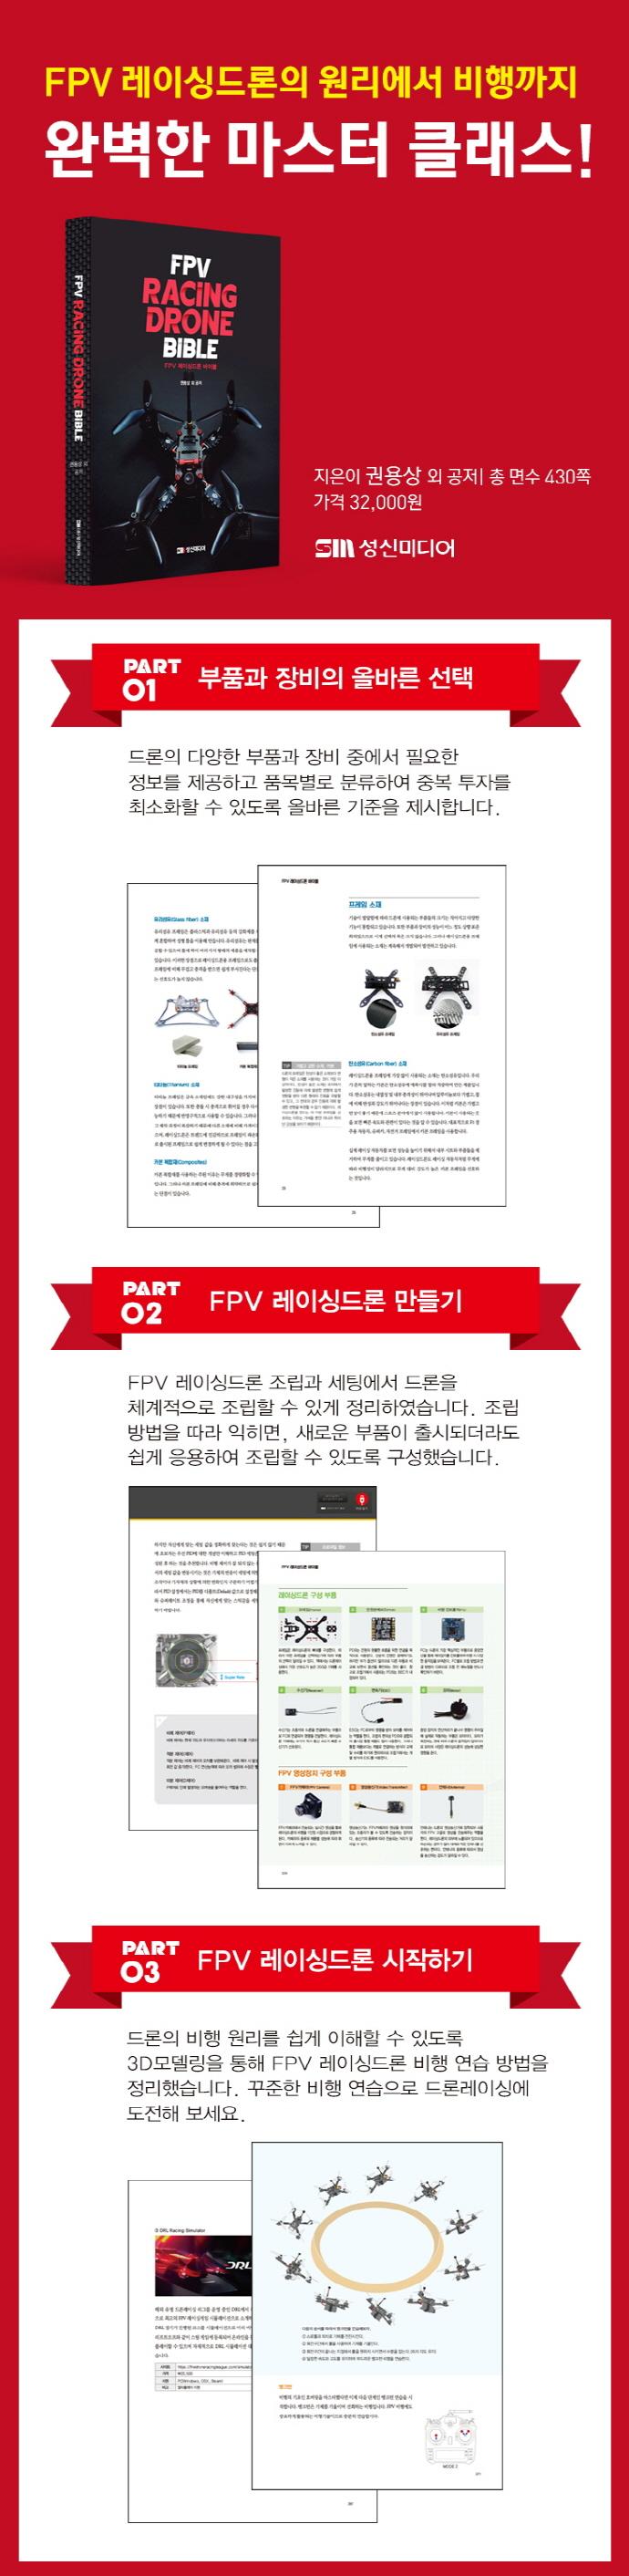 FPV 레이싱드론 바이블 도서 상세이미지